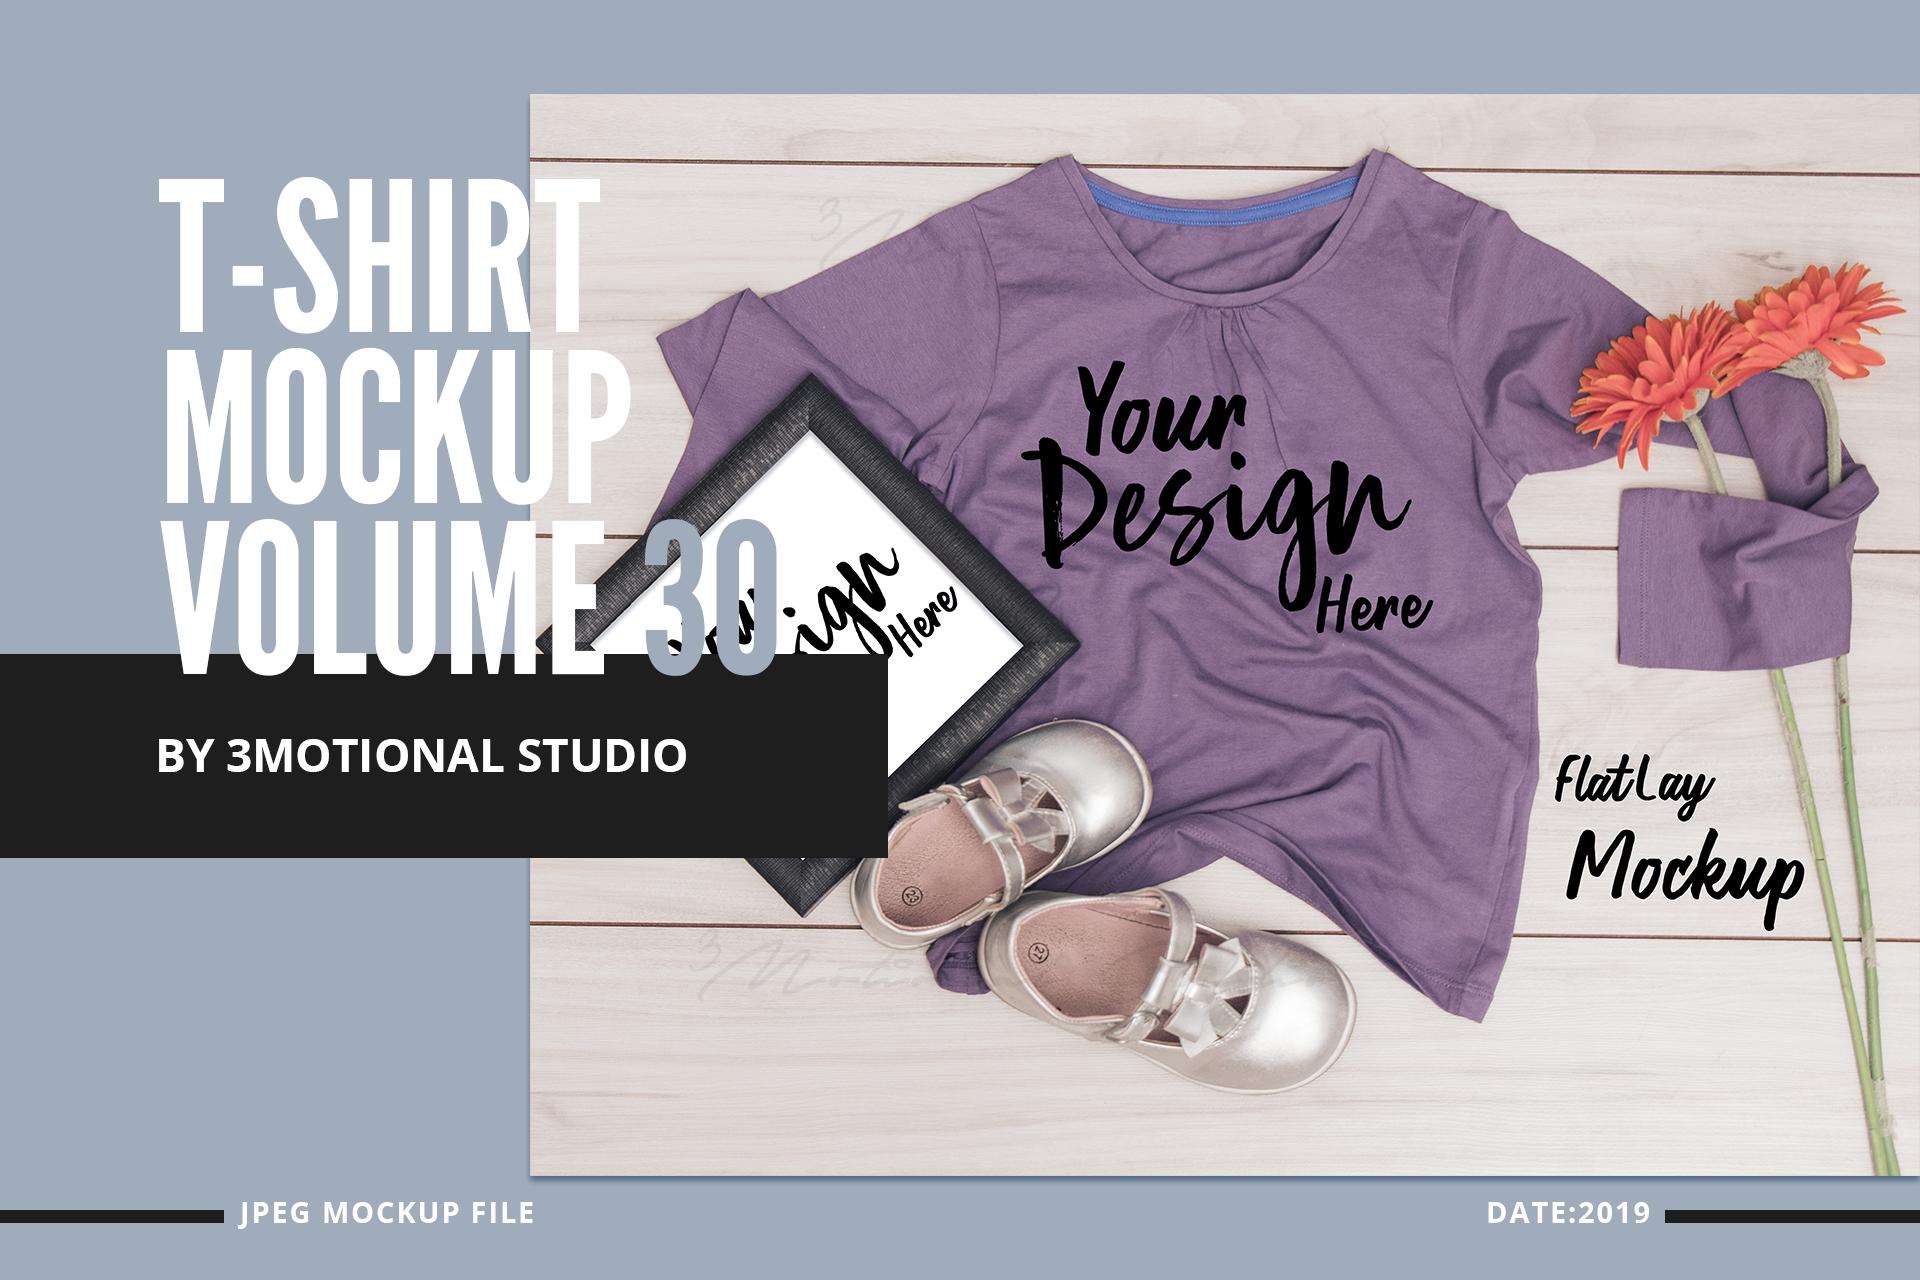 Neo T-Shirt Mockup Volume 30 example image 1